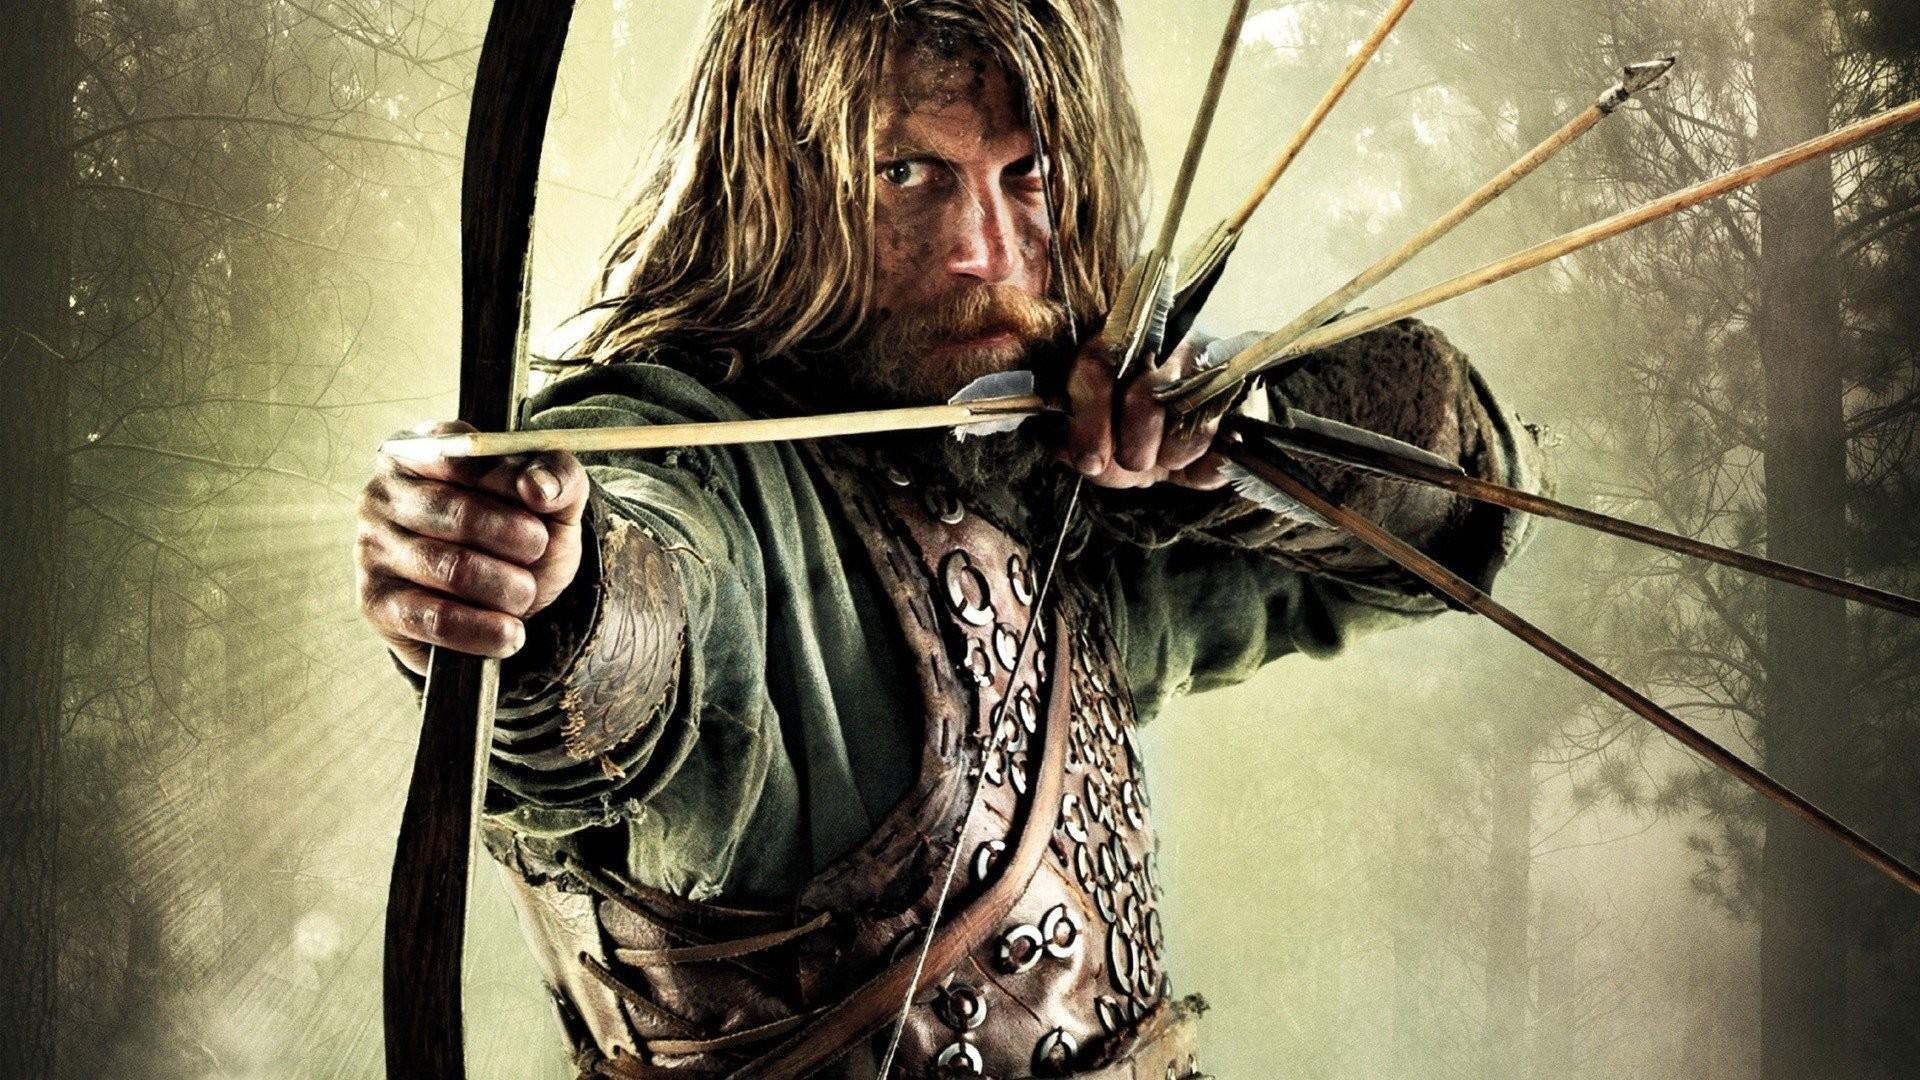 NORTHMEN VIKING SAGA fantasy action adventure history fighting 1northmen warrior  wallpaper     580221   WallpaperUP